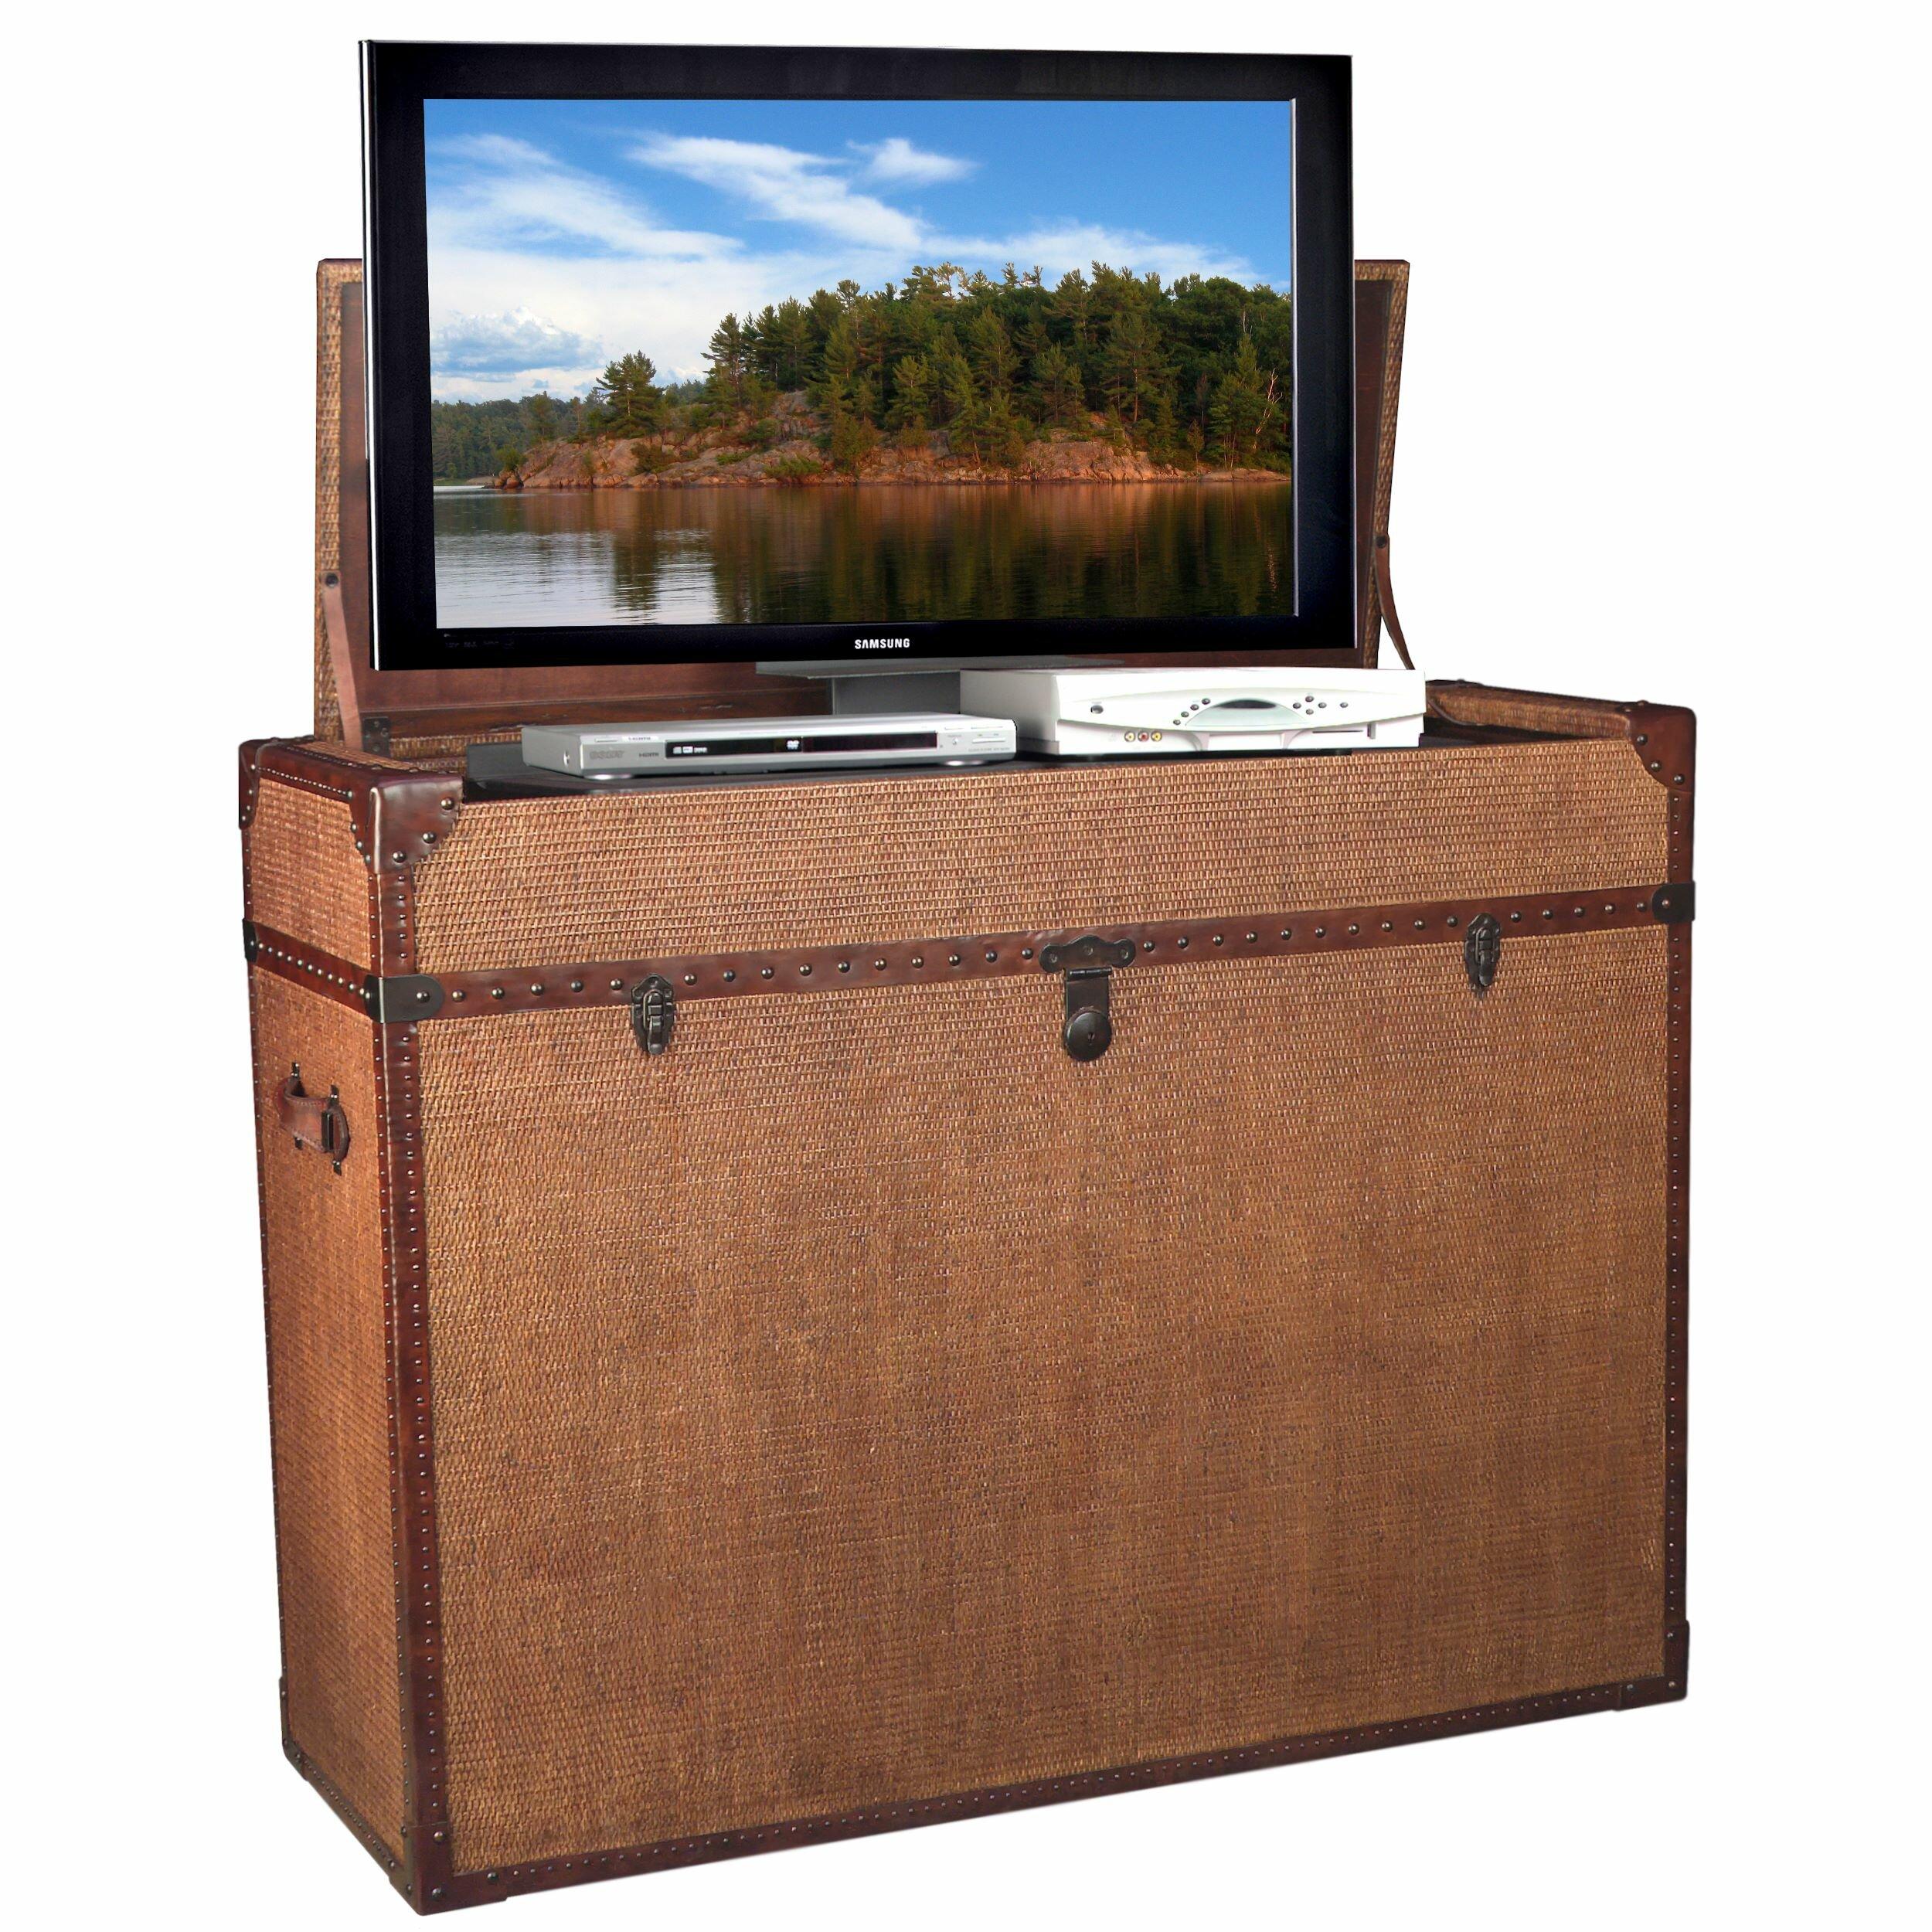 tvliftcabinet inc bermuda run tv stand reviews wayfair. Black Bedroom Furniture Sets. Home Design Ideas